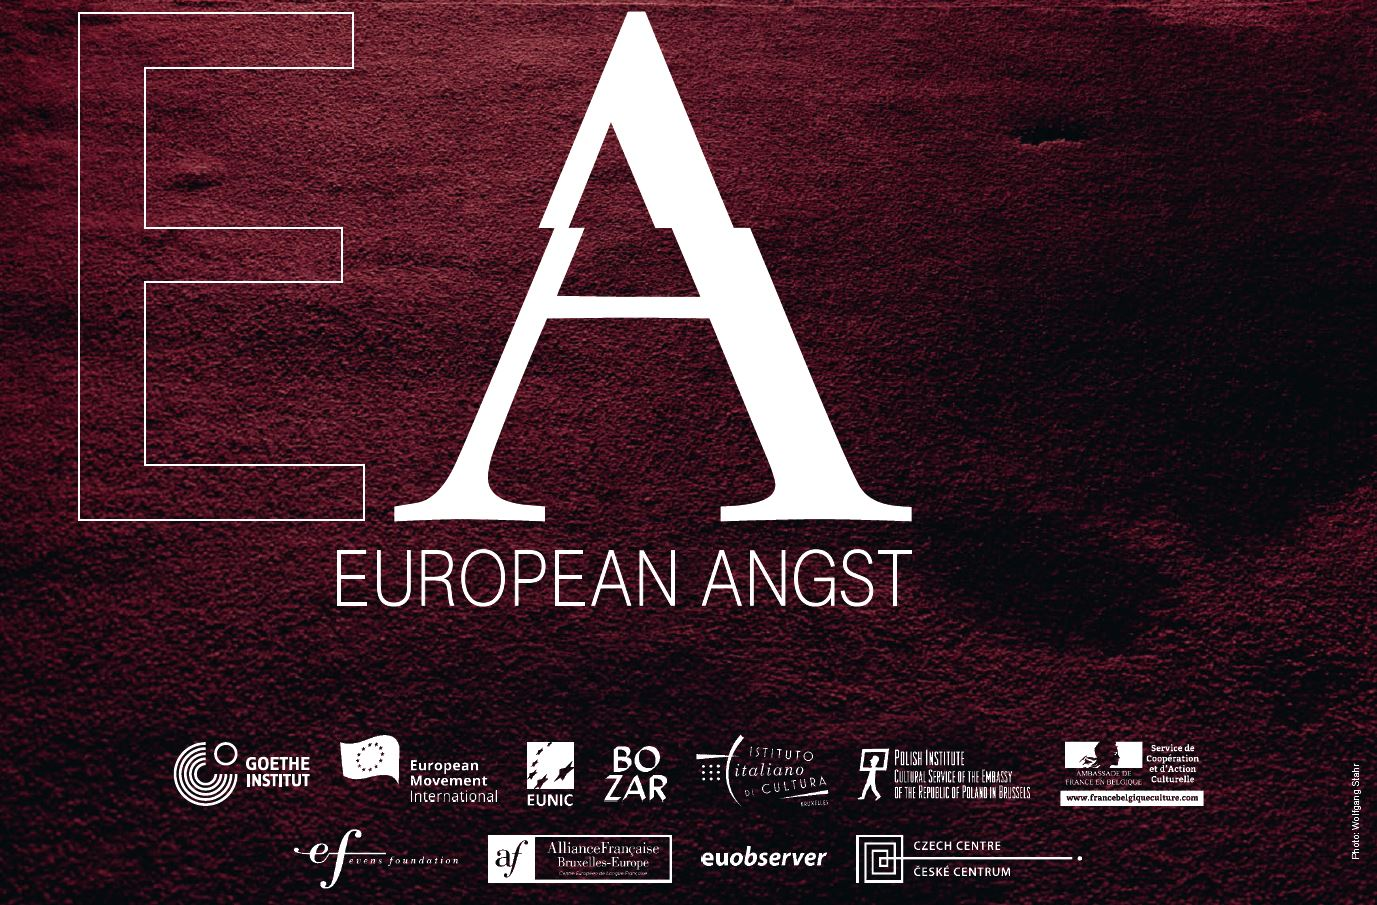 Popülizm, Extremizm ve Avrupa Şüpheciliği Üzerine Konferans